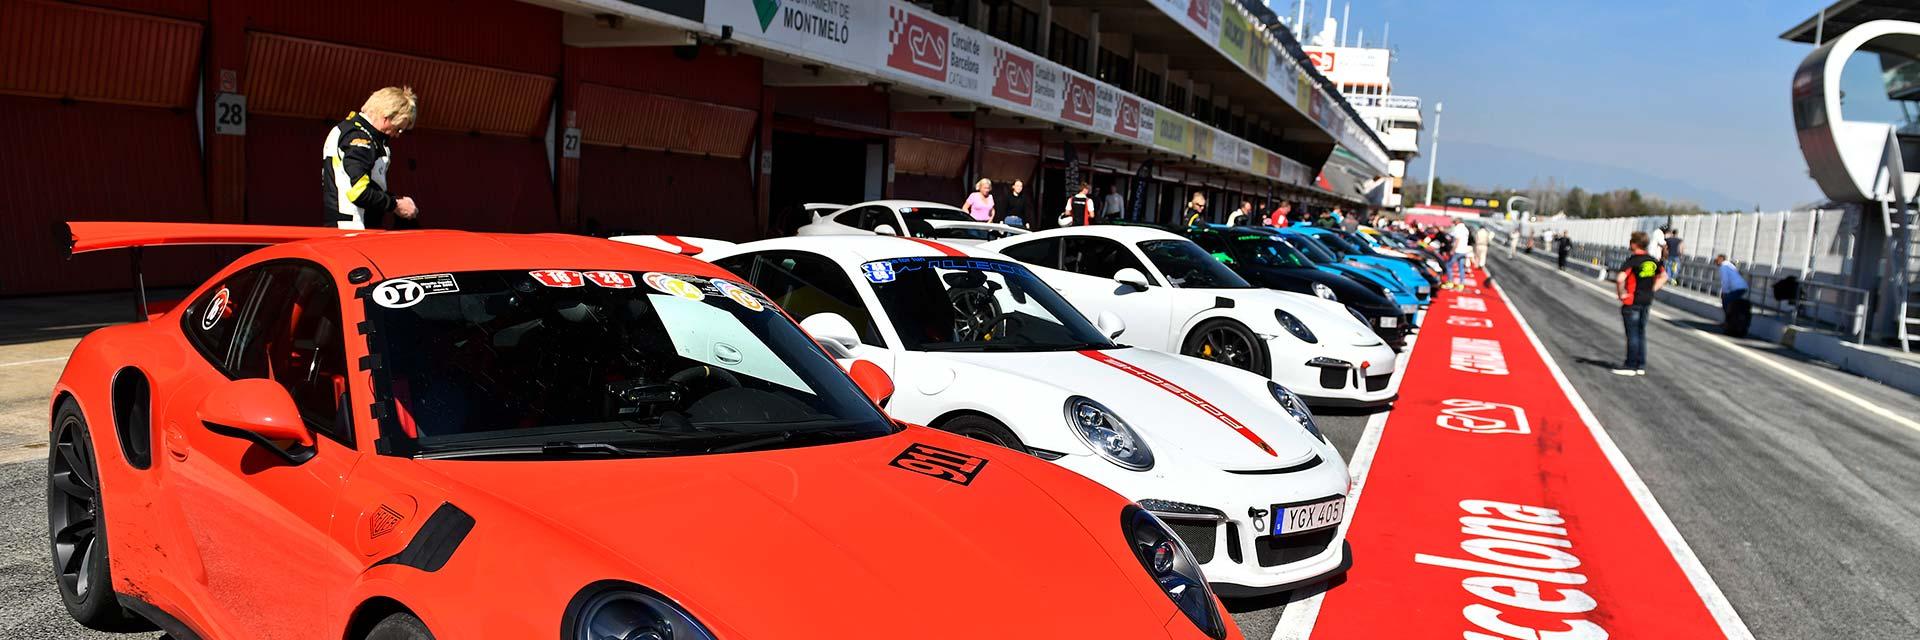 GEDLICH Racing - Kontakt